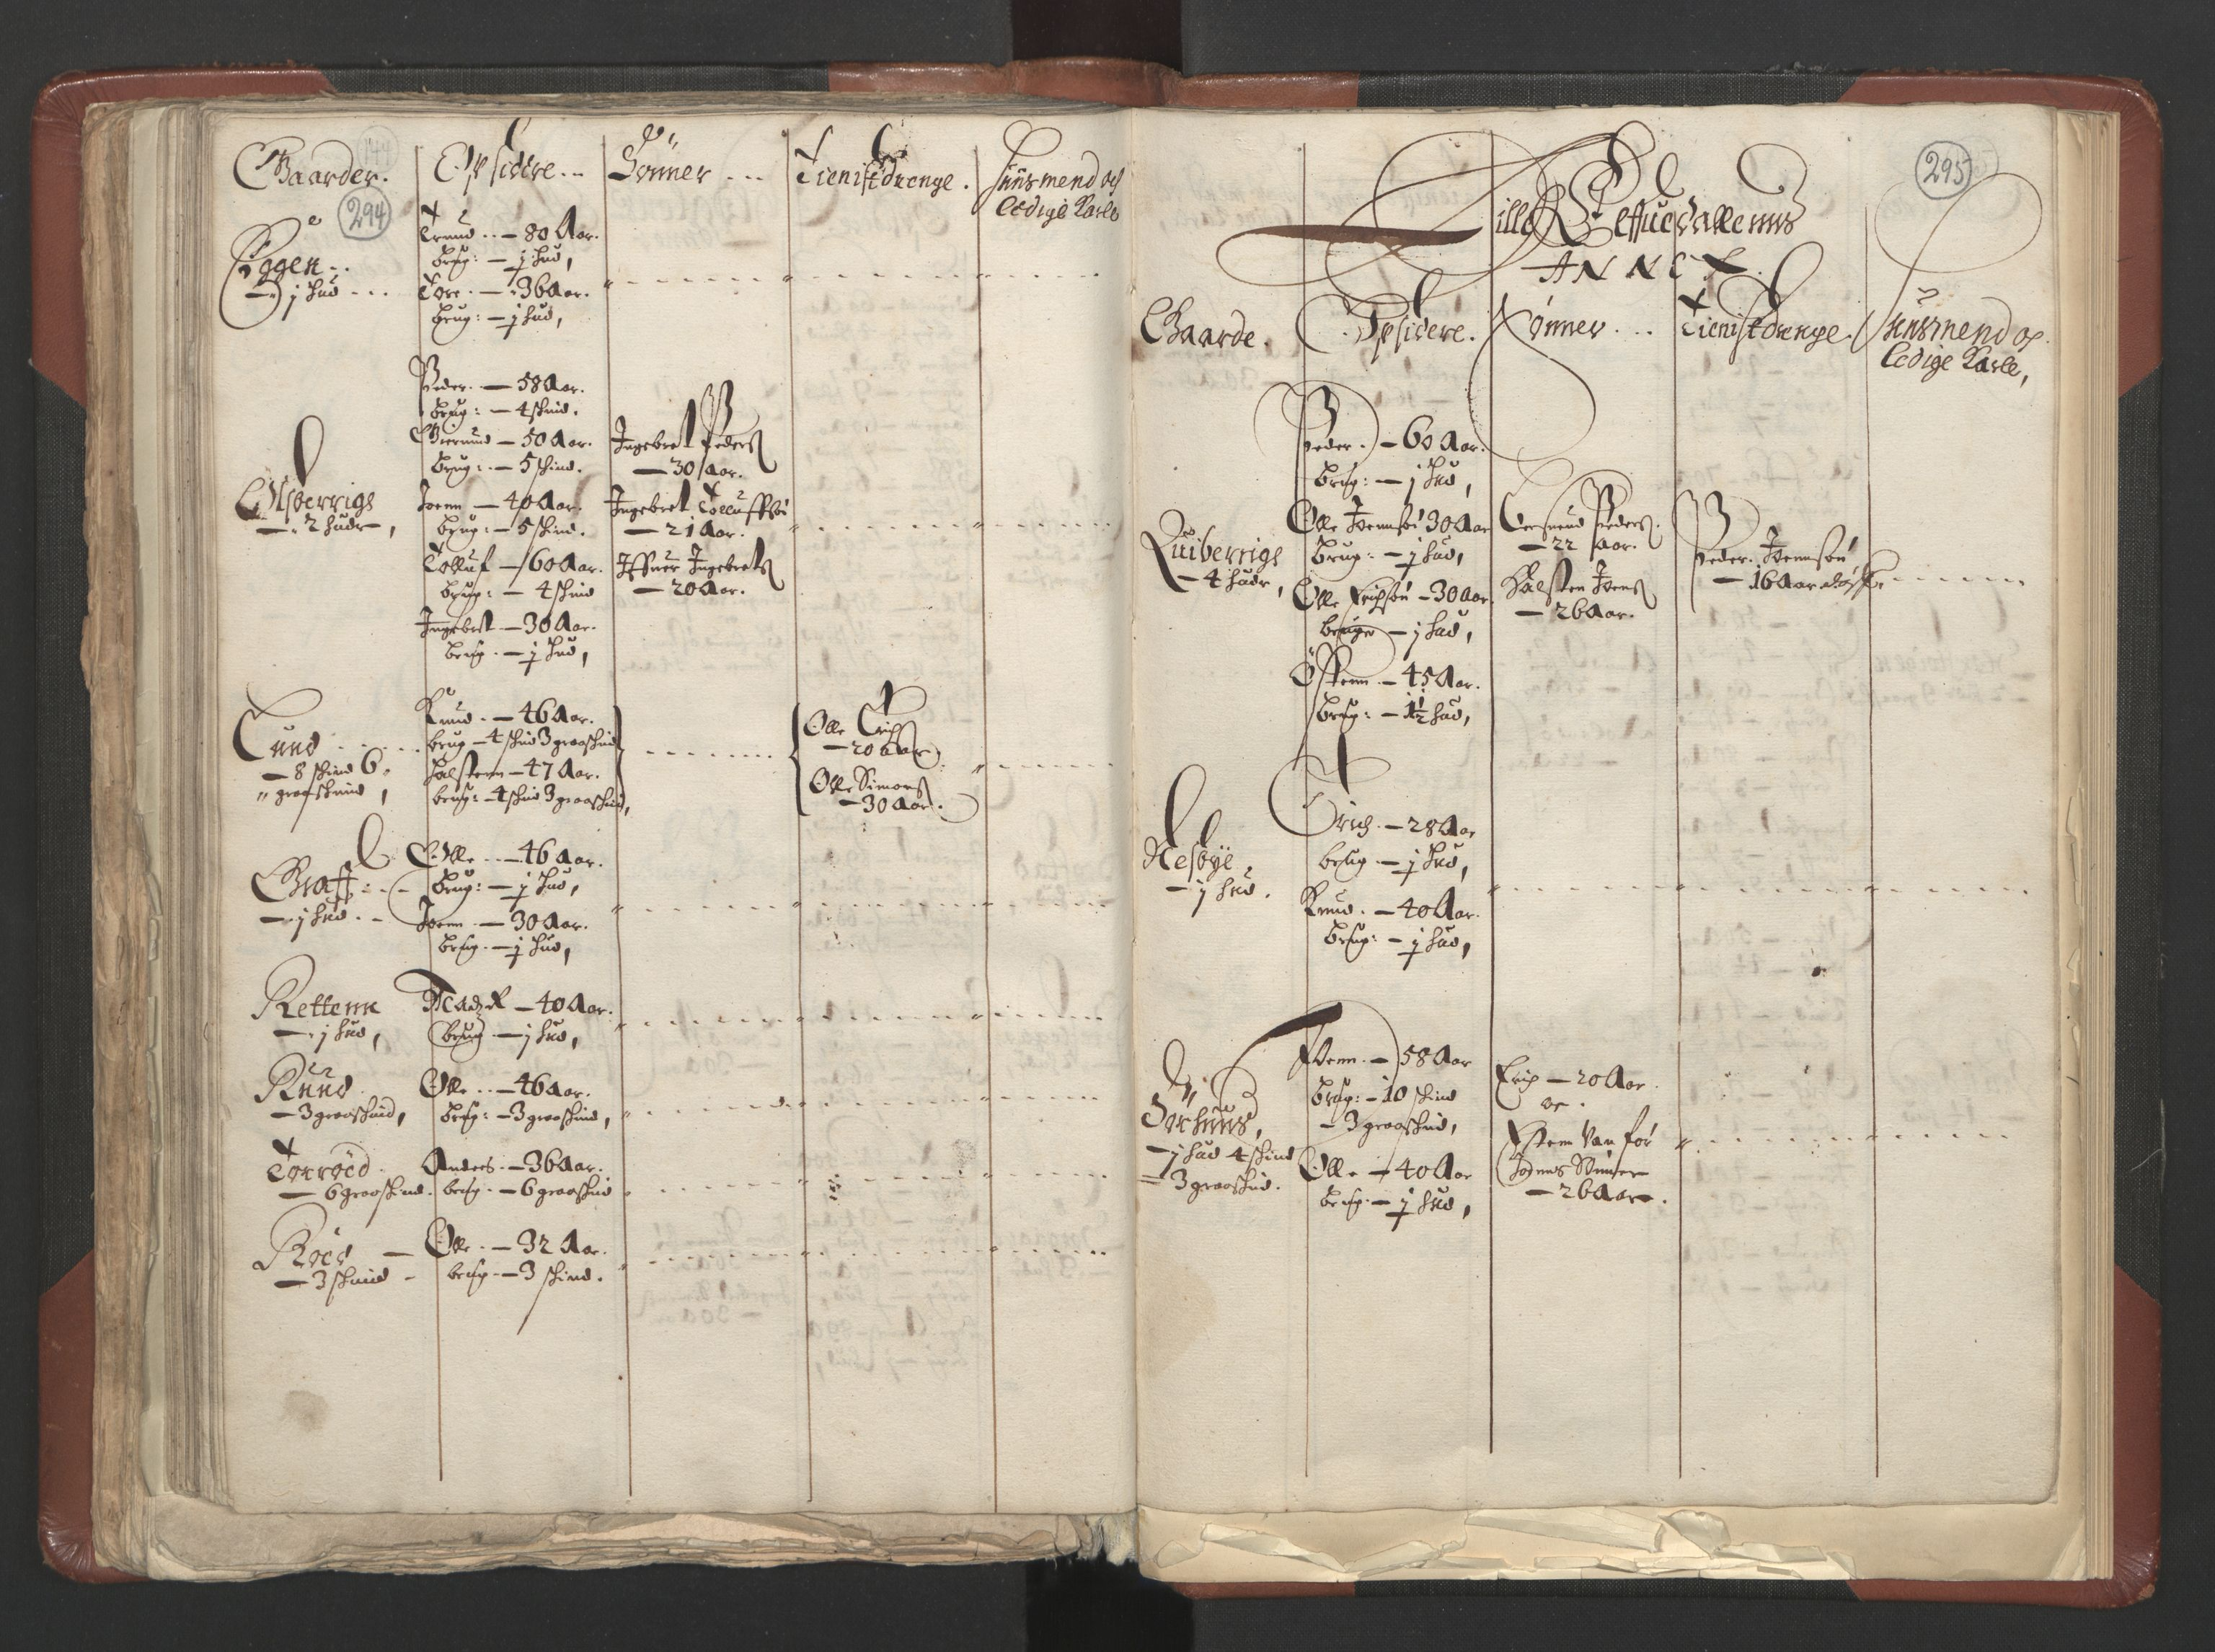 RA, Fogdenes og sorenskrivernes manntall 1664-1666, nr. 3: Hedmark fogderi og Solør, Østerdal og Odal fogderi, 1664, s. 294-295